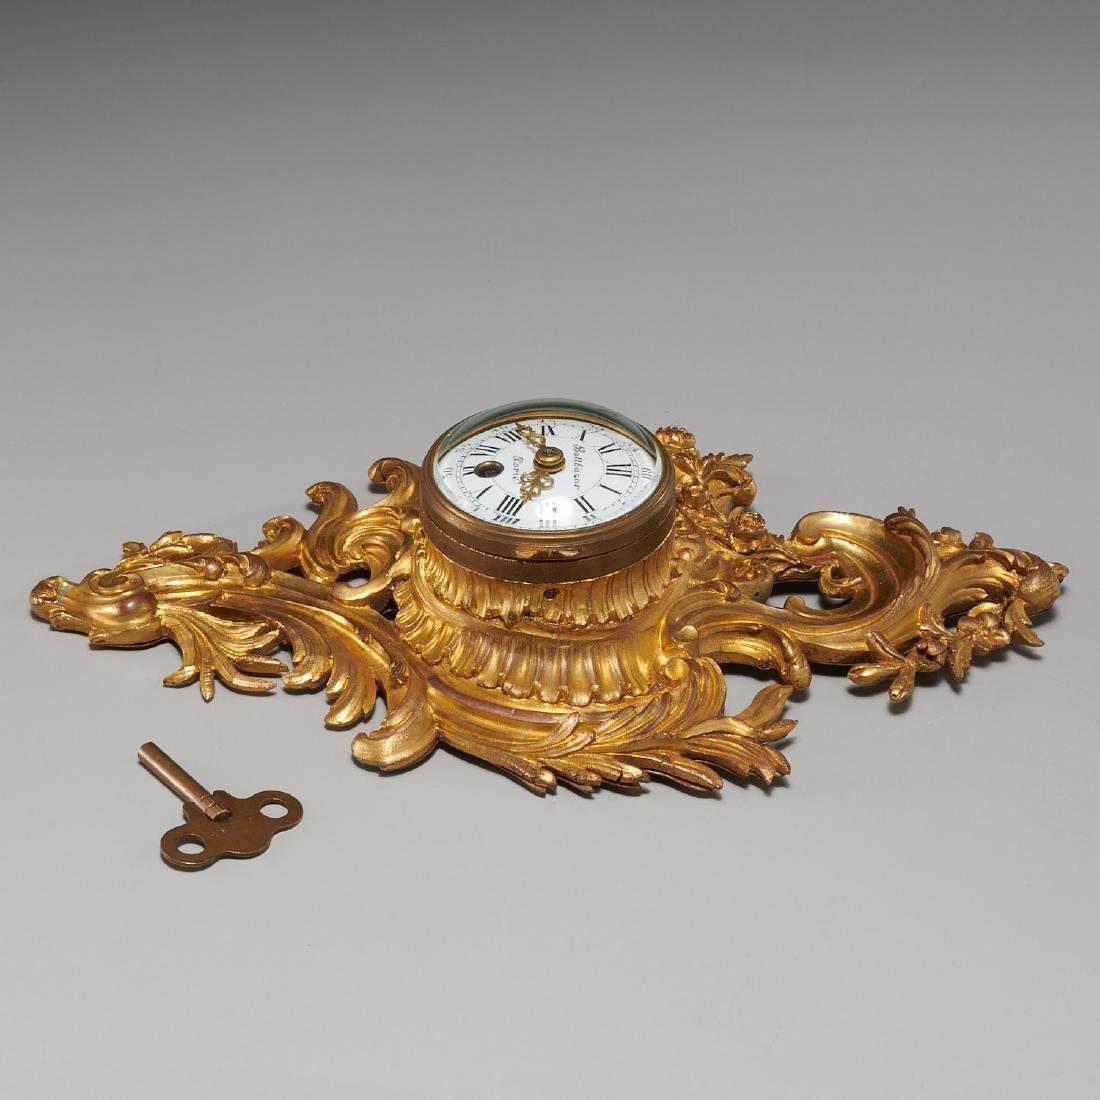 French cartel clock signed Balthazar, Paris - 7